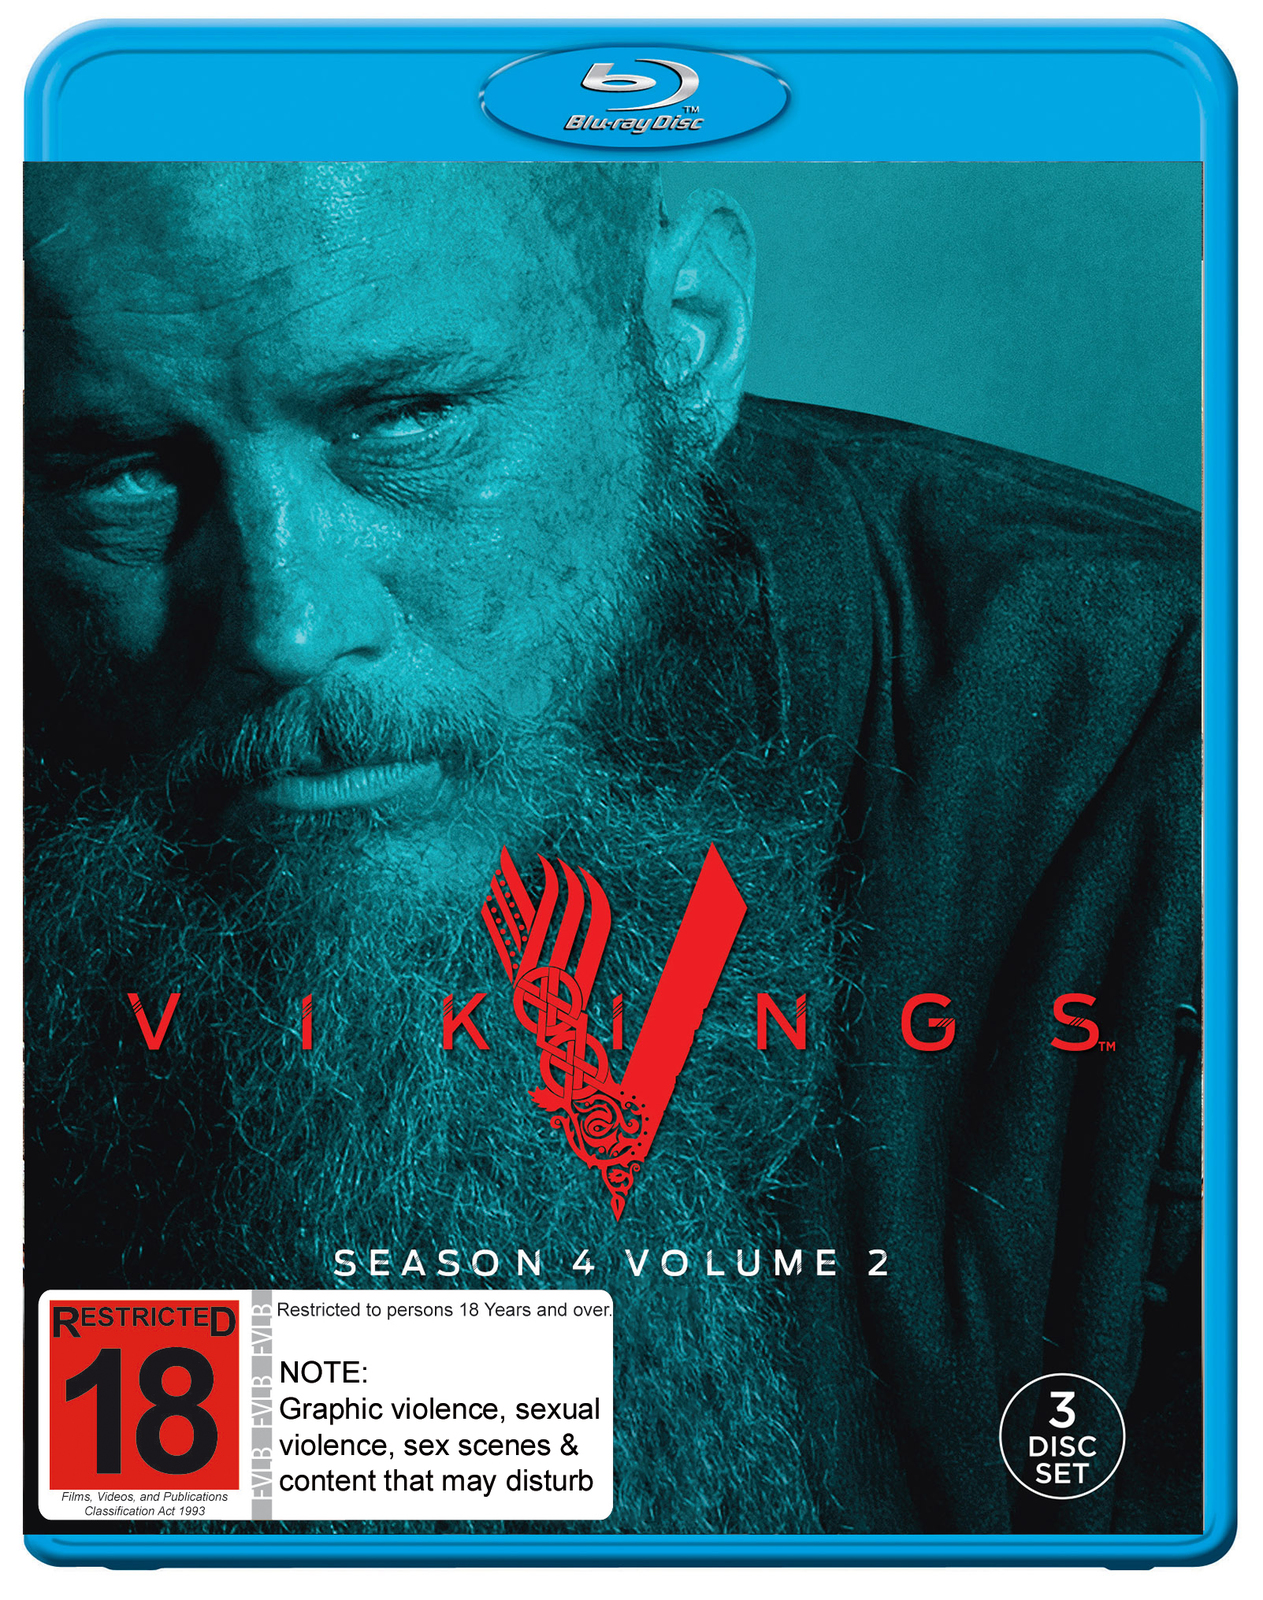 Vikings: Season 4 - Volume 2 on Blu-ray image